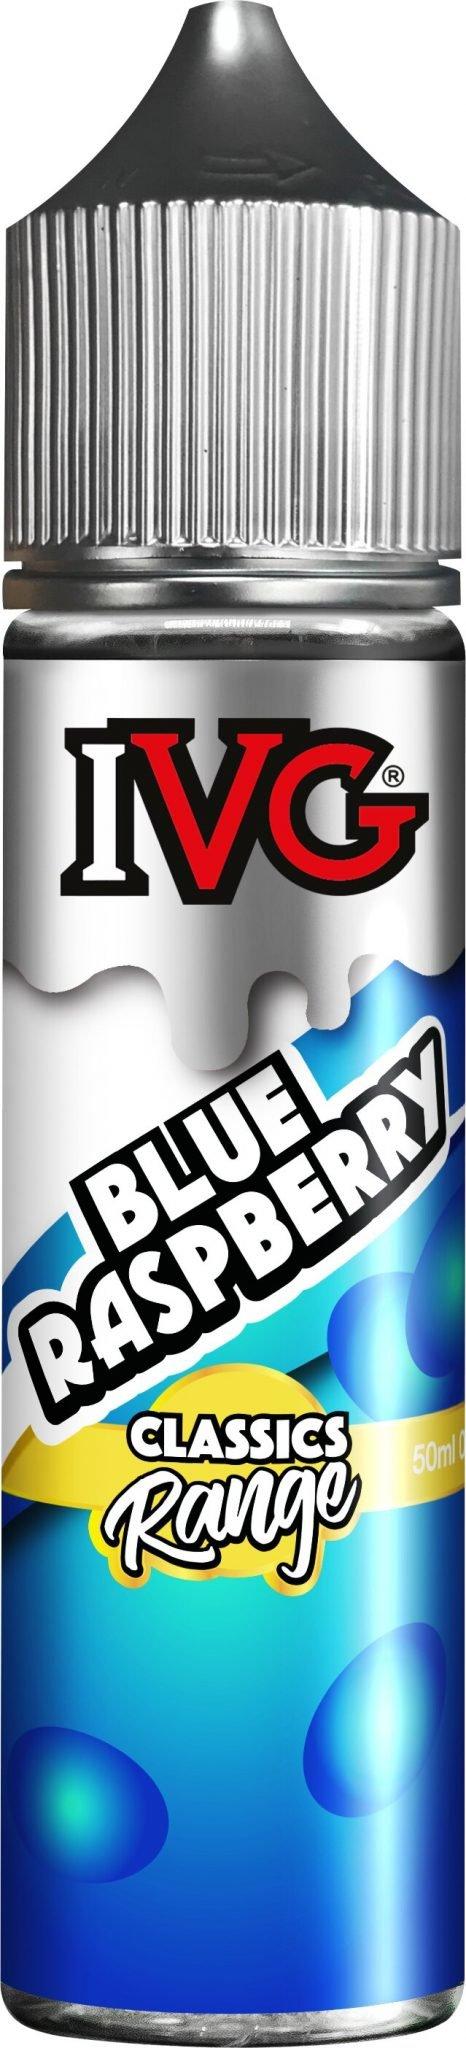 IVG Blue Raspberry UK